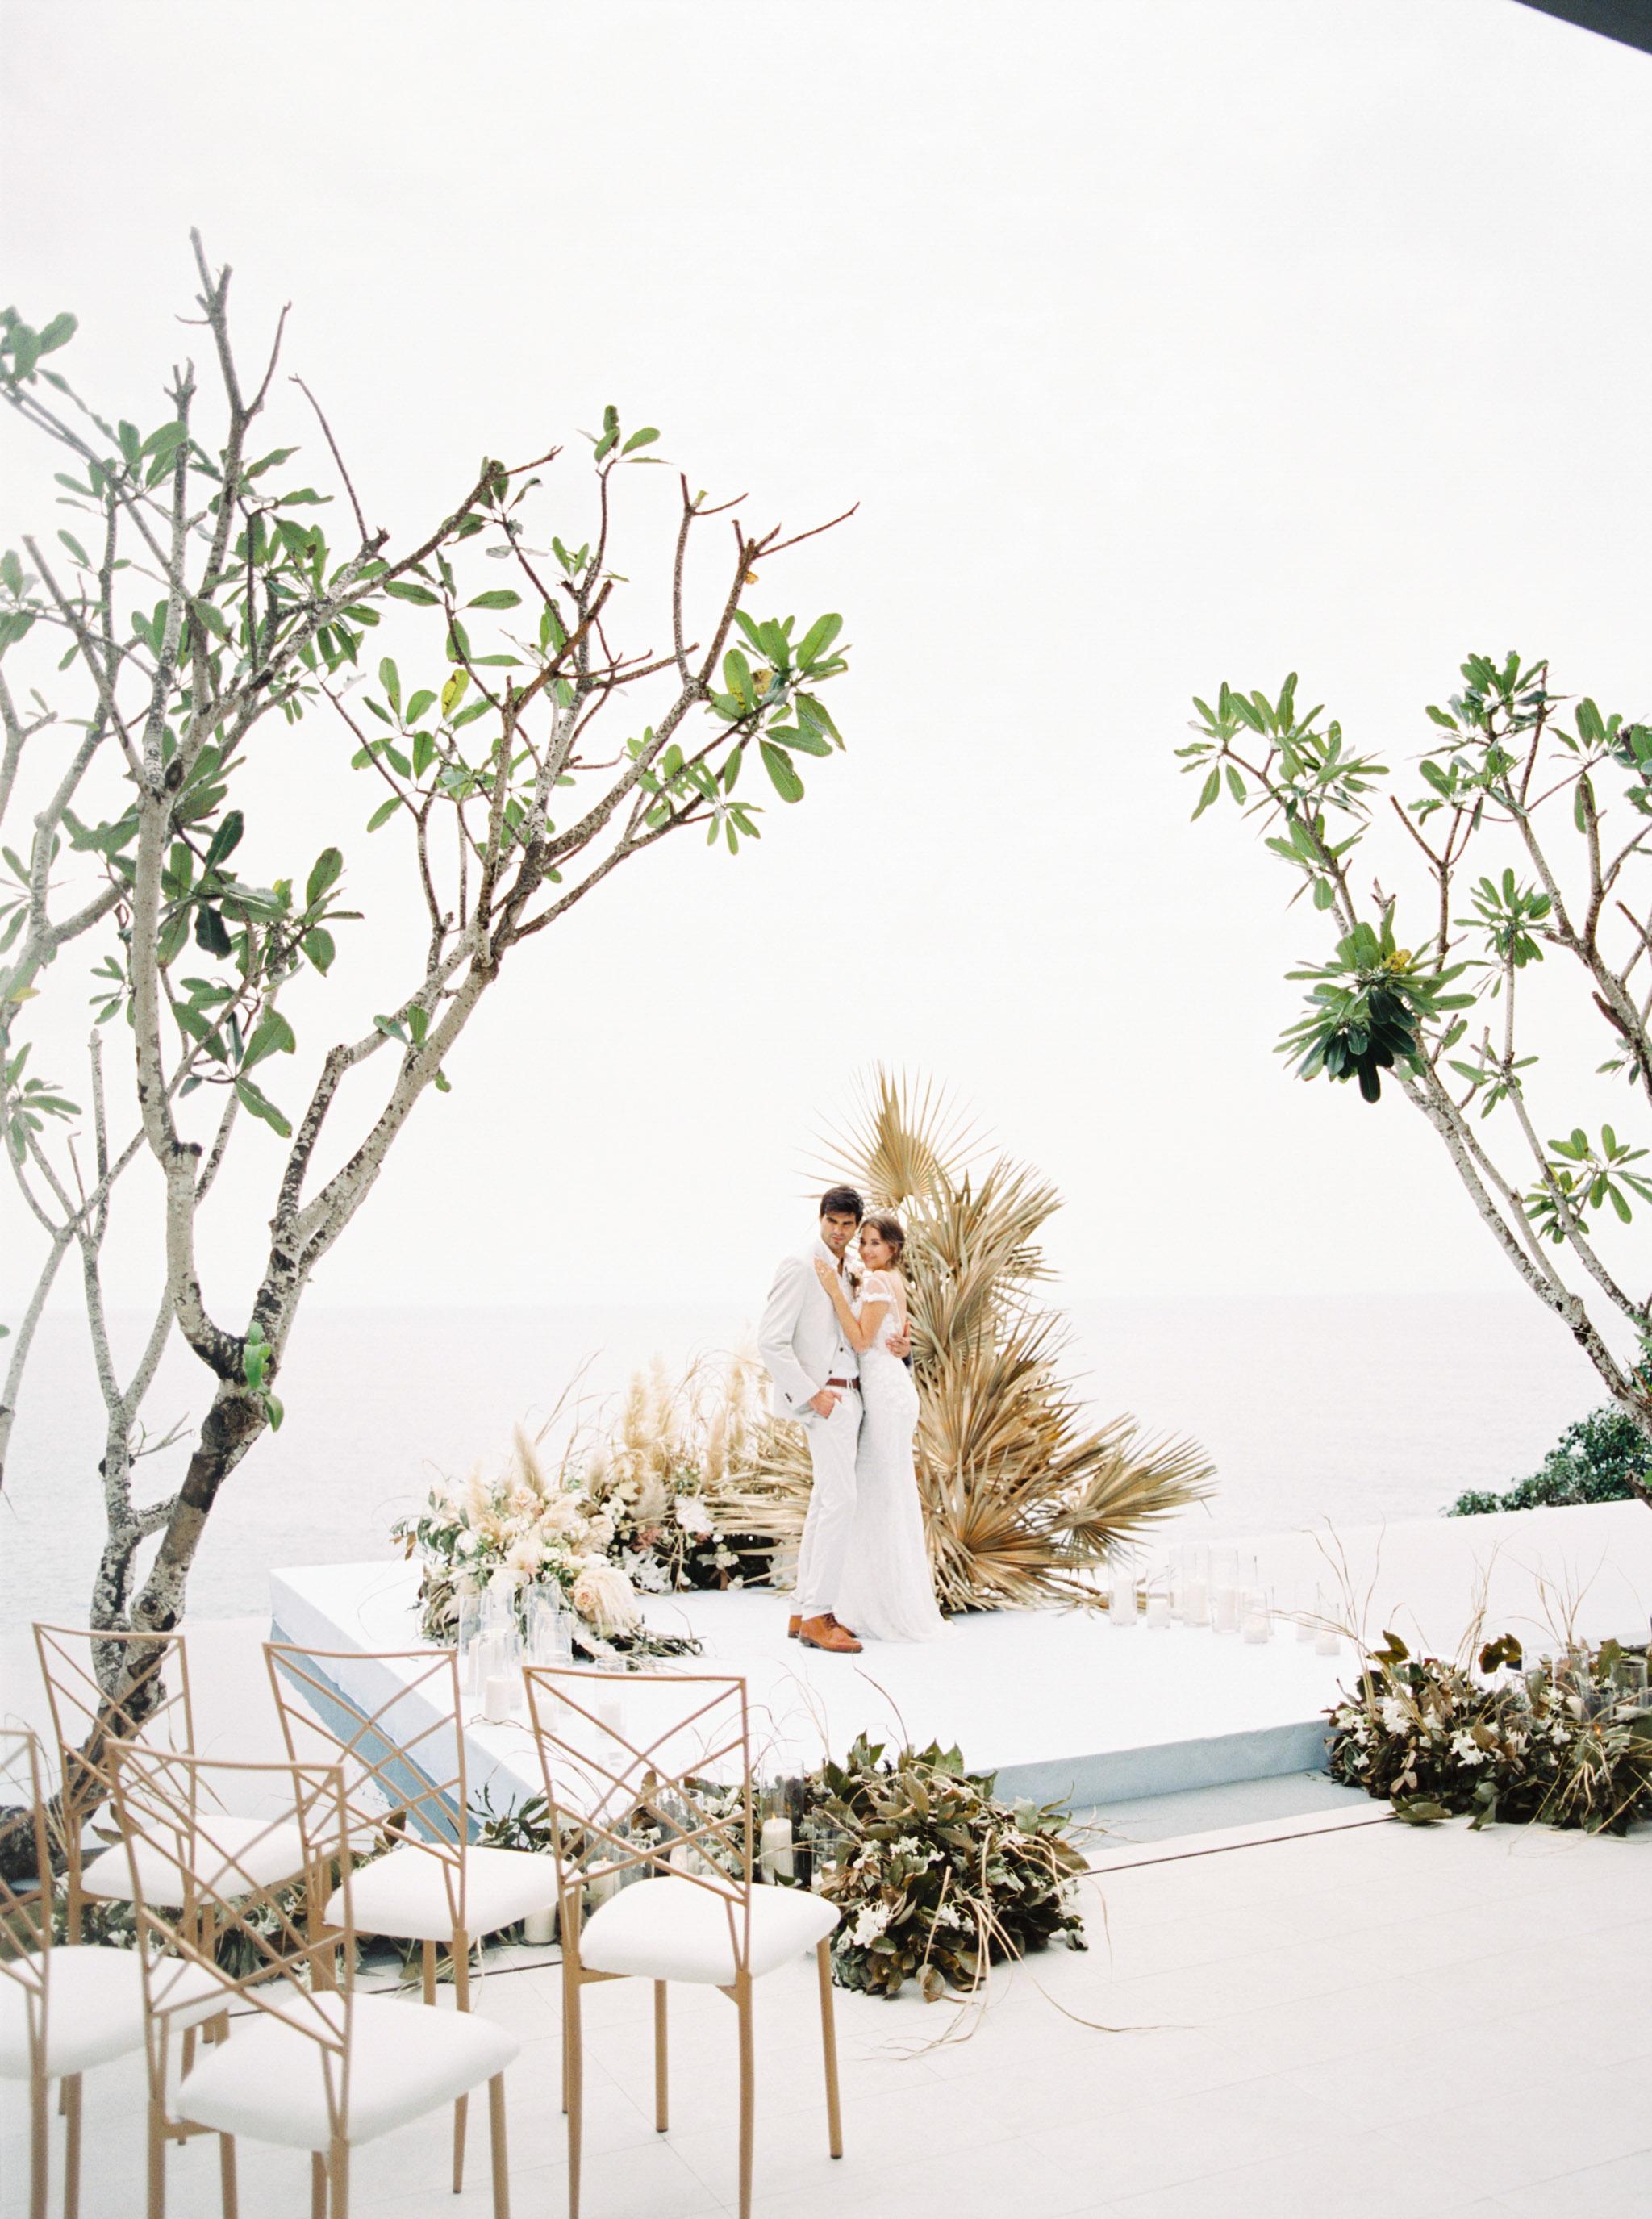 Destination Wedding at The Aquila Luxury Villas in Phuket Thailand Fine Art Film Wedding Photographer Sheri McMahon-00006-6.jpg